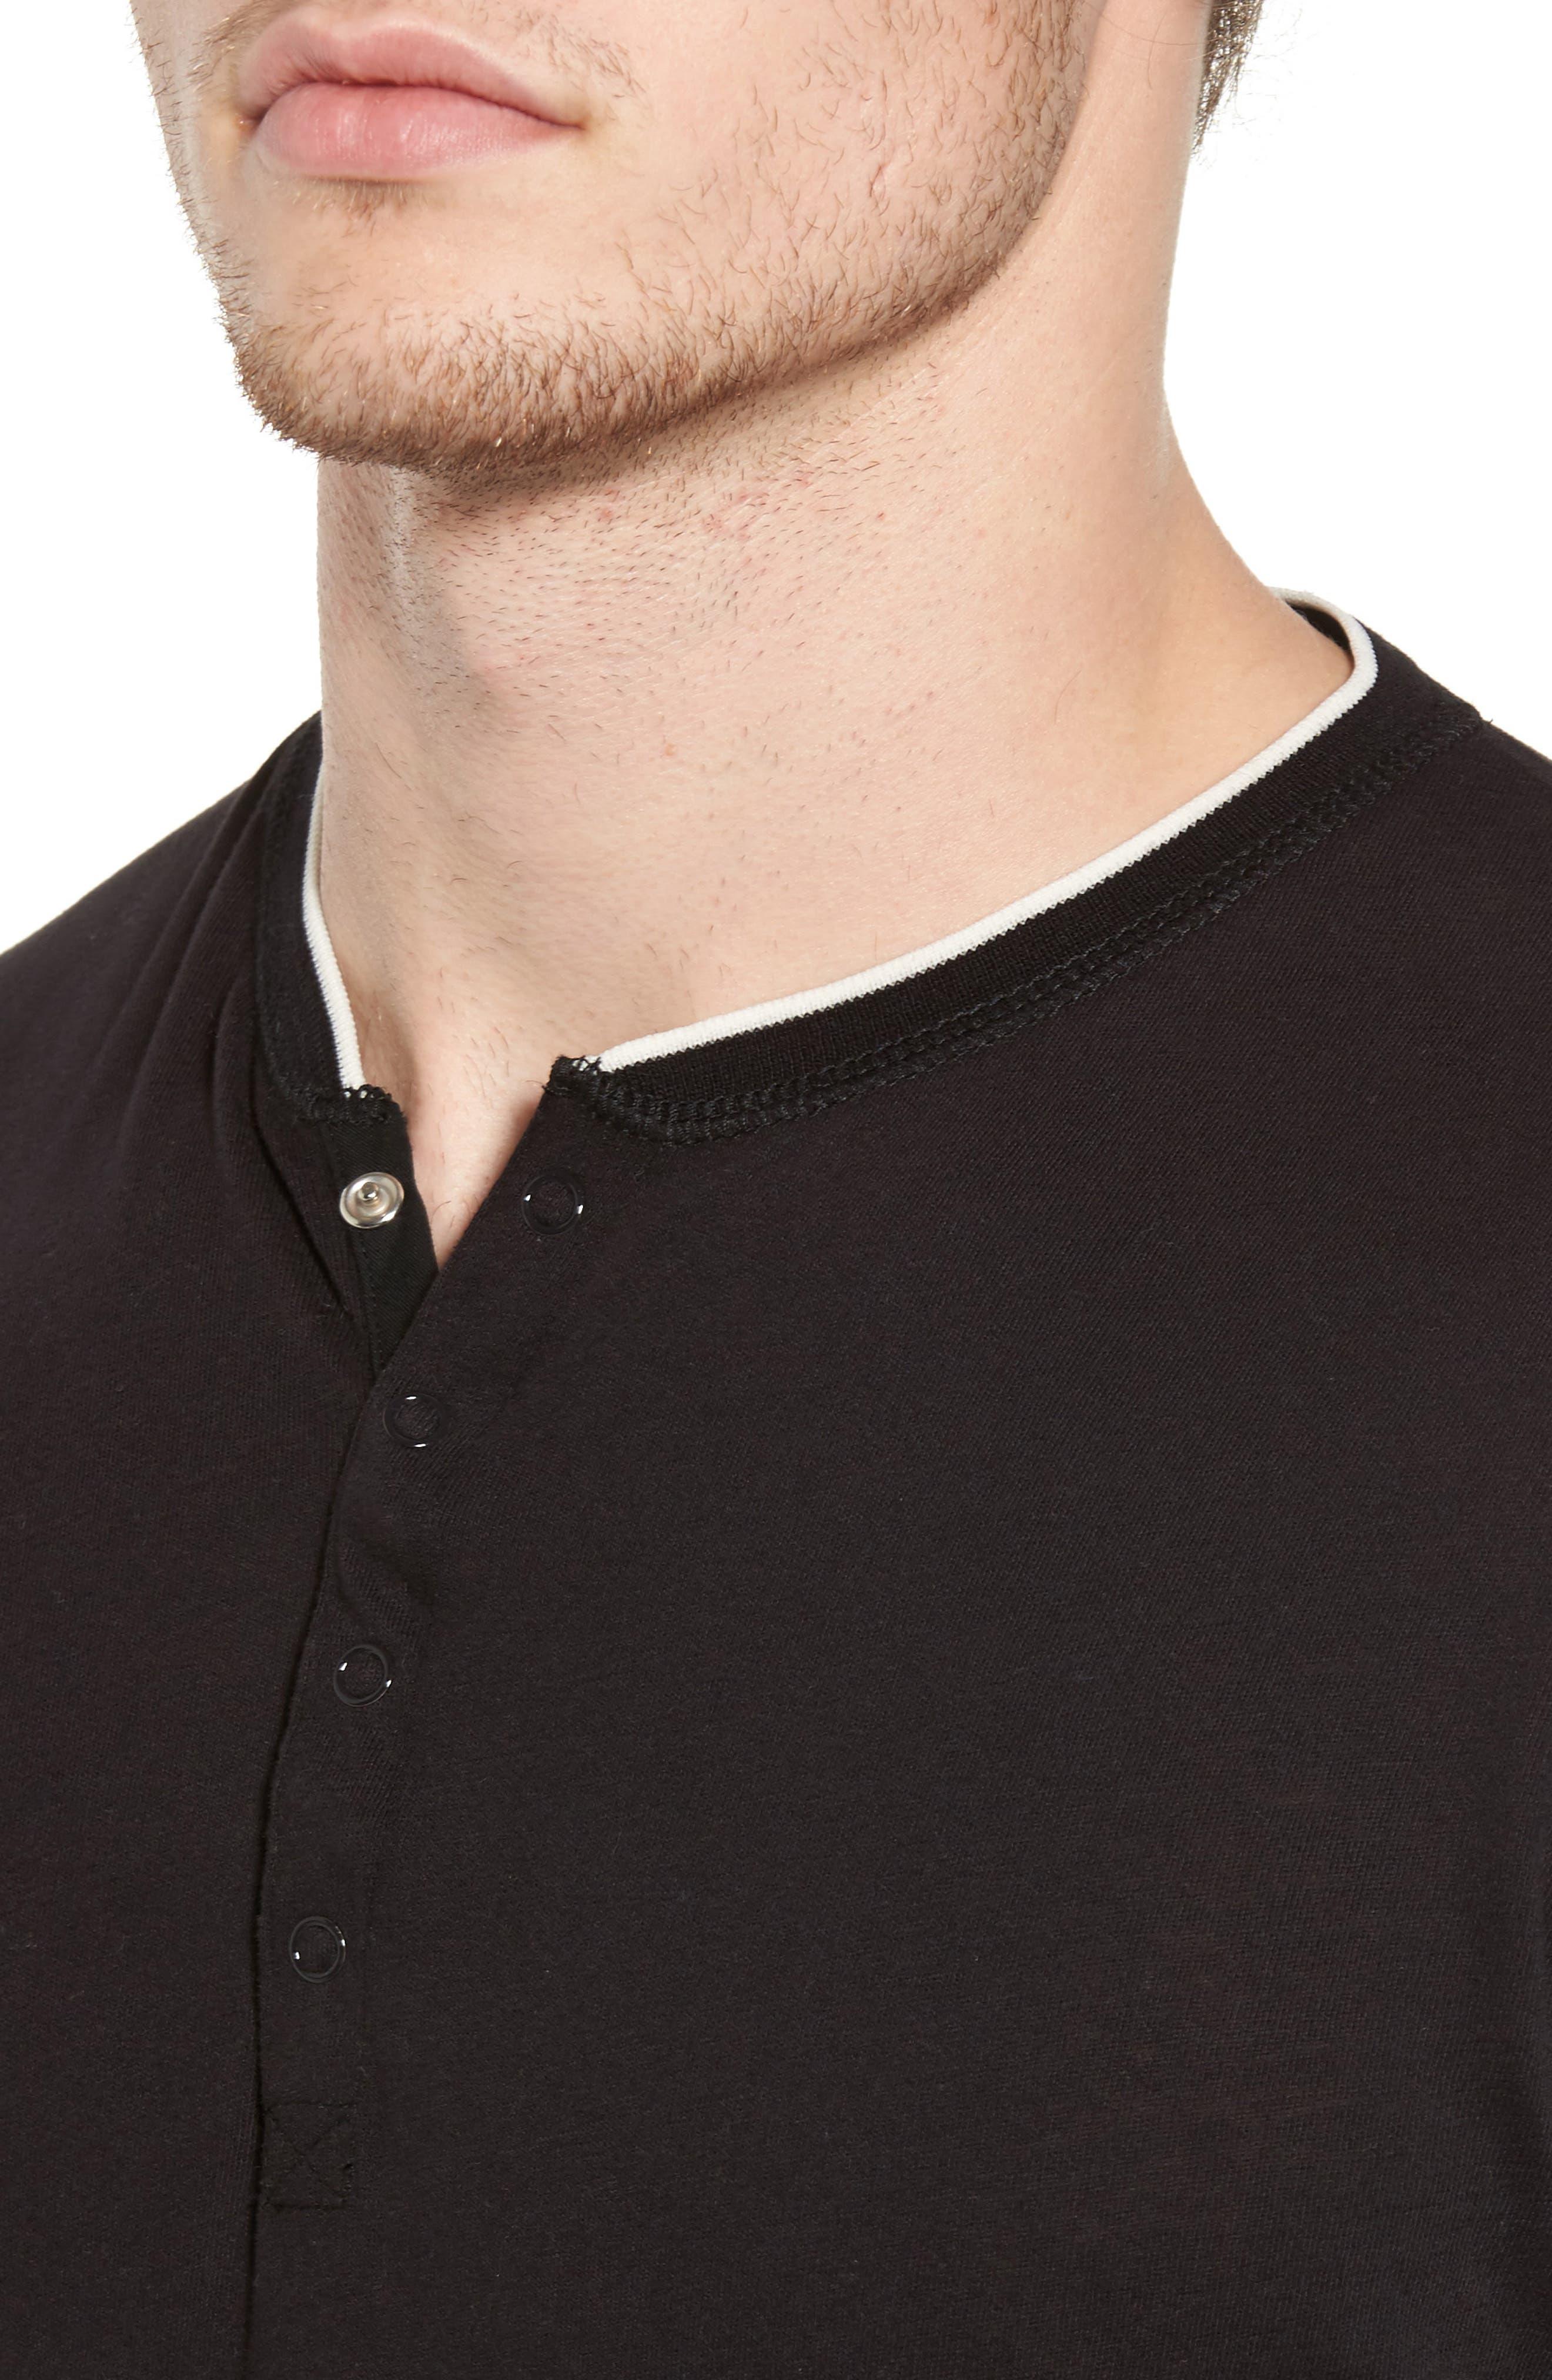 Club Nomade Soft Granddad T-Shirt,                             Alternate thumbnail 4, color,